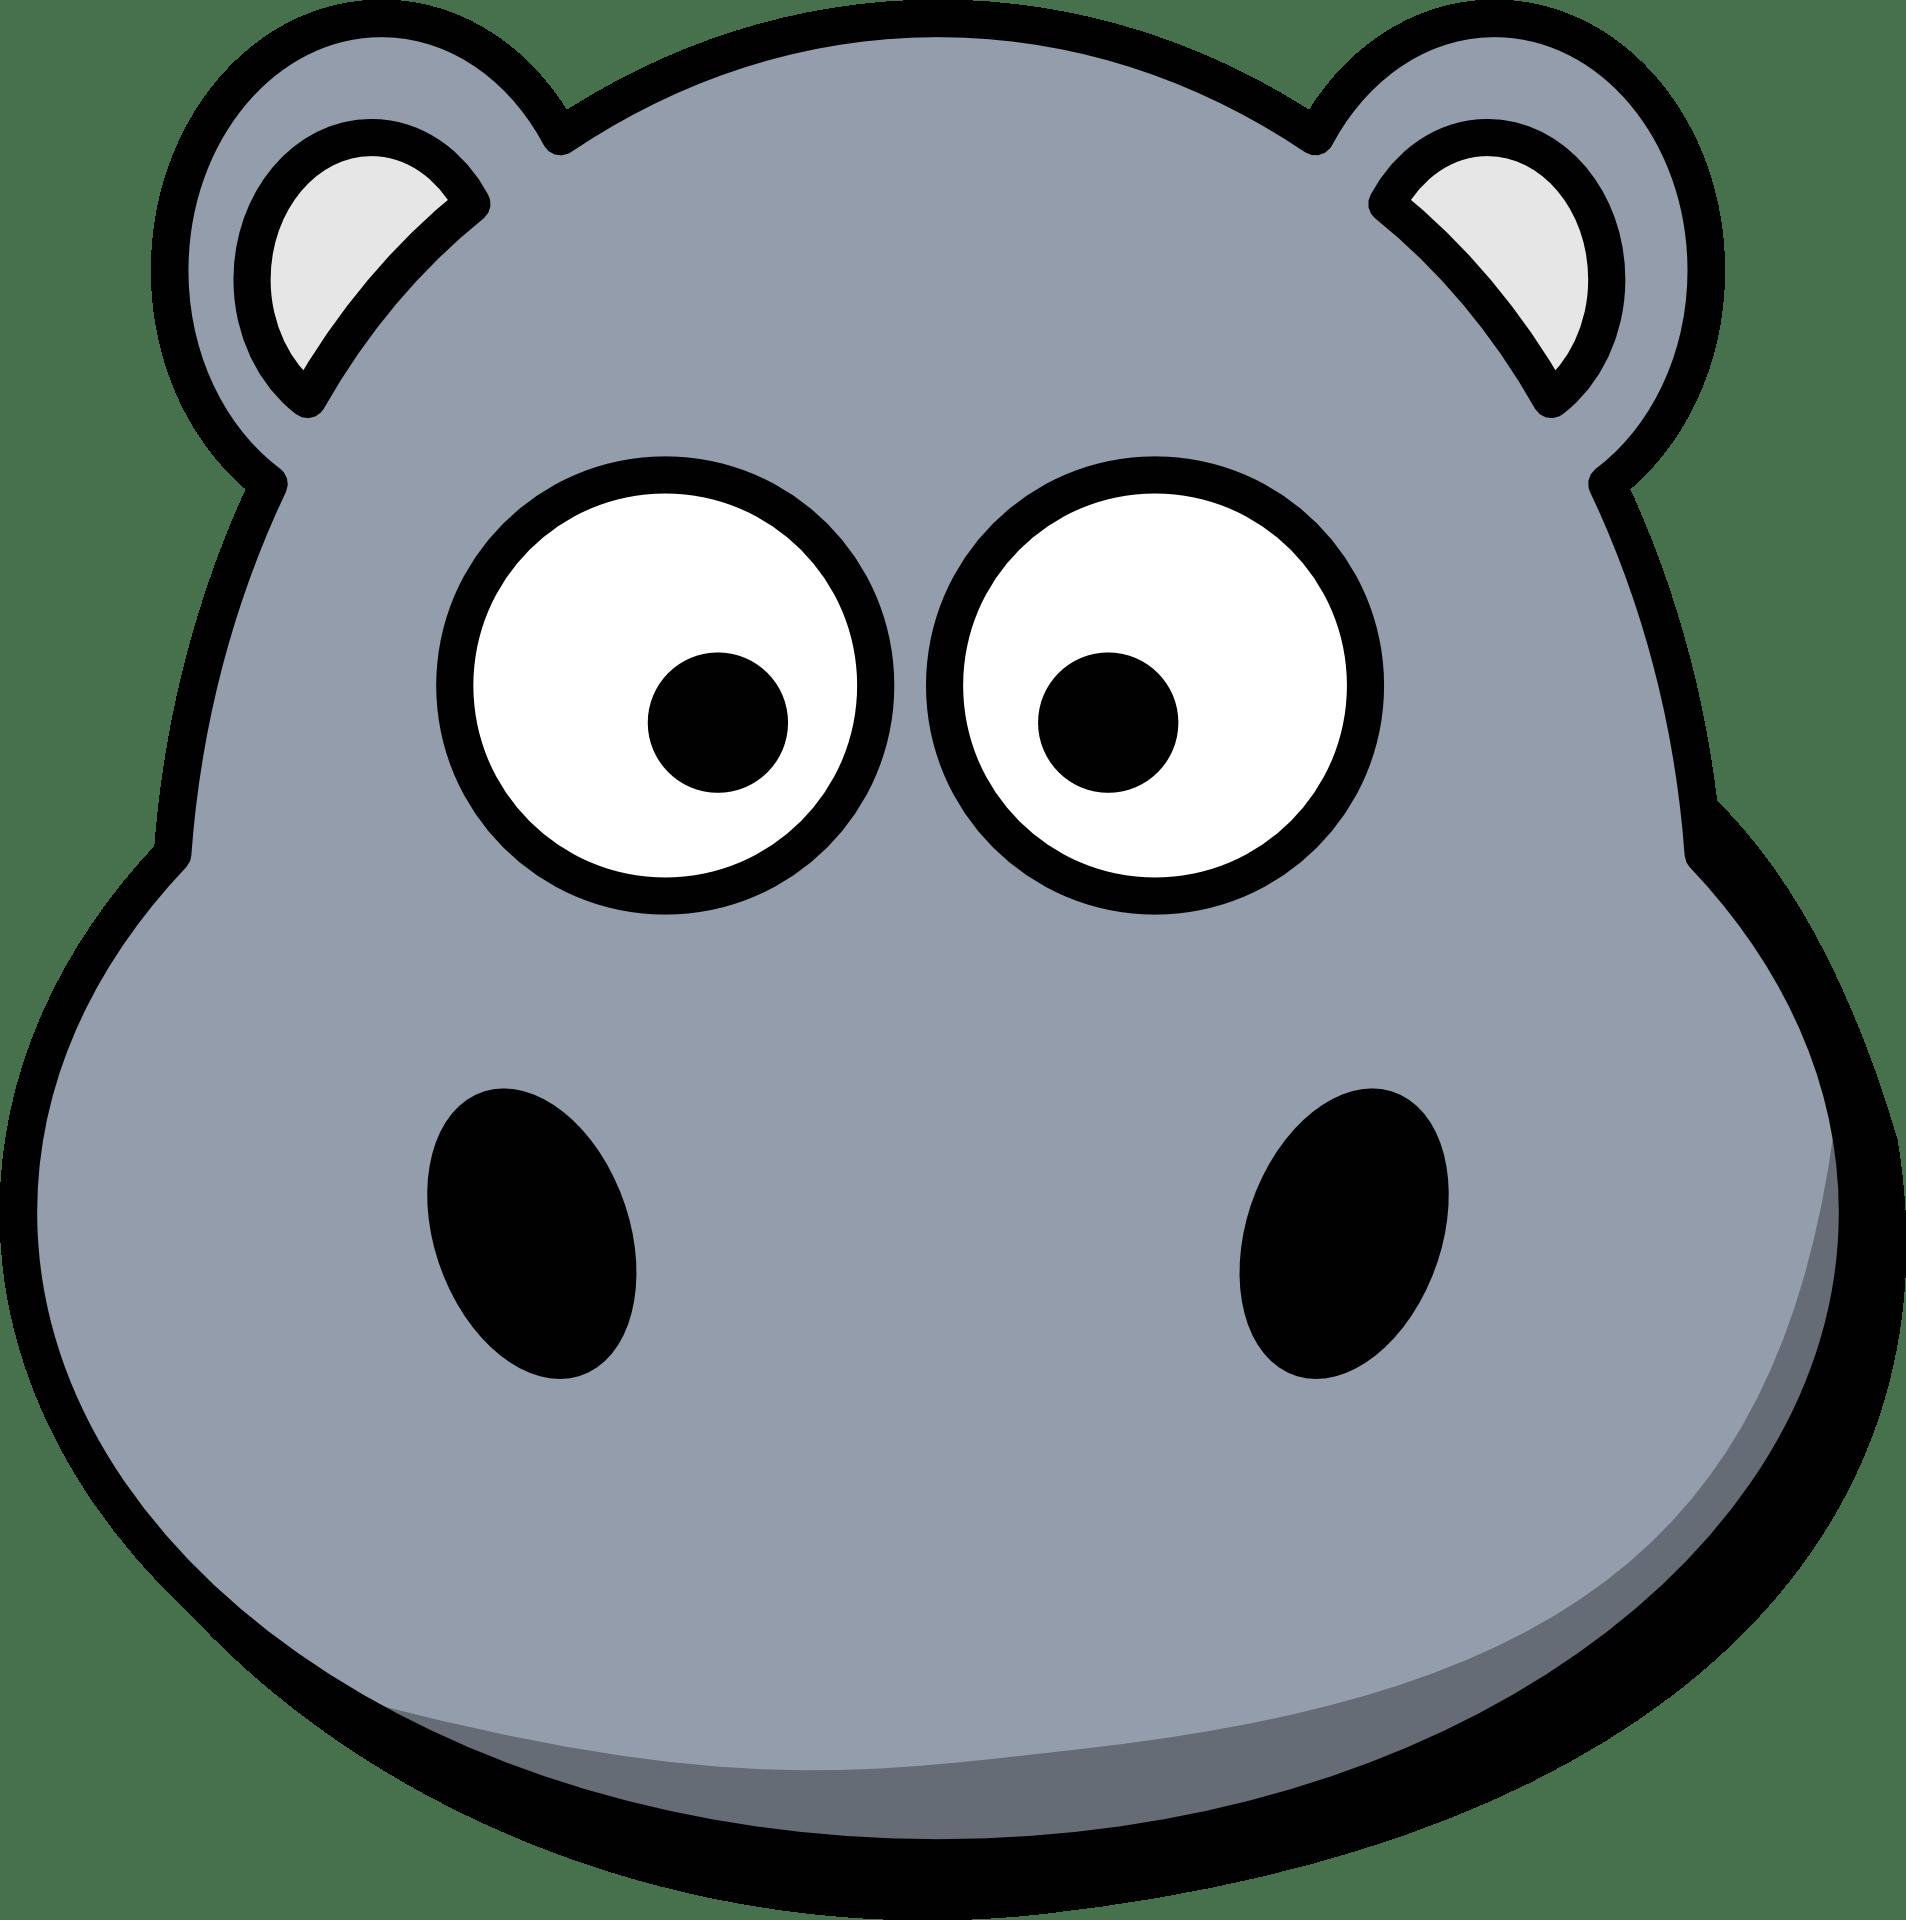 hippo face template - HD1906×1920